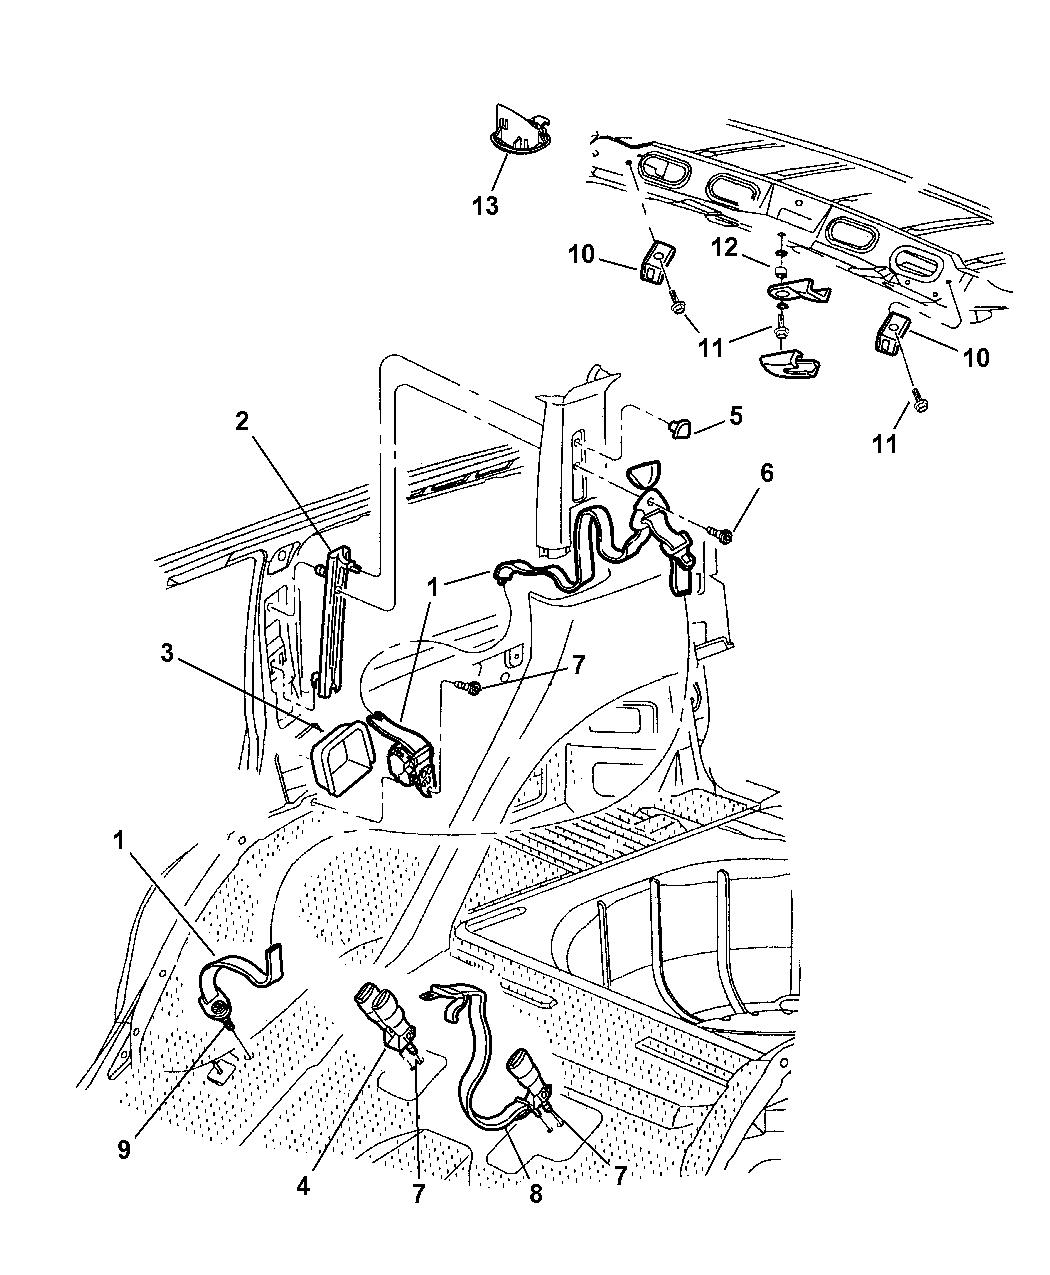 5fp491t5ab